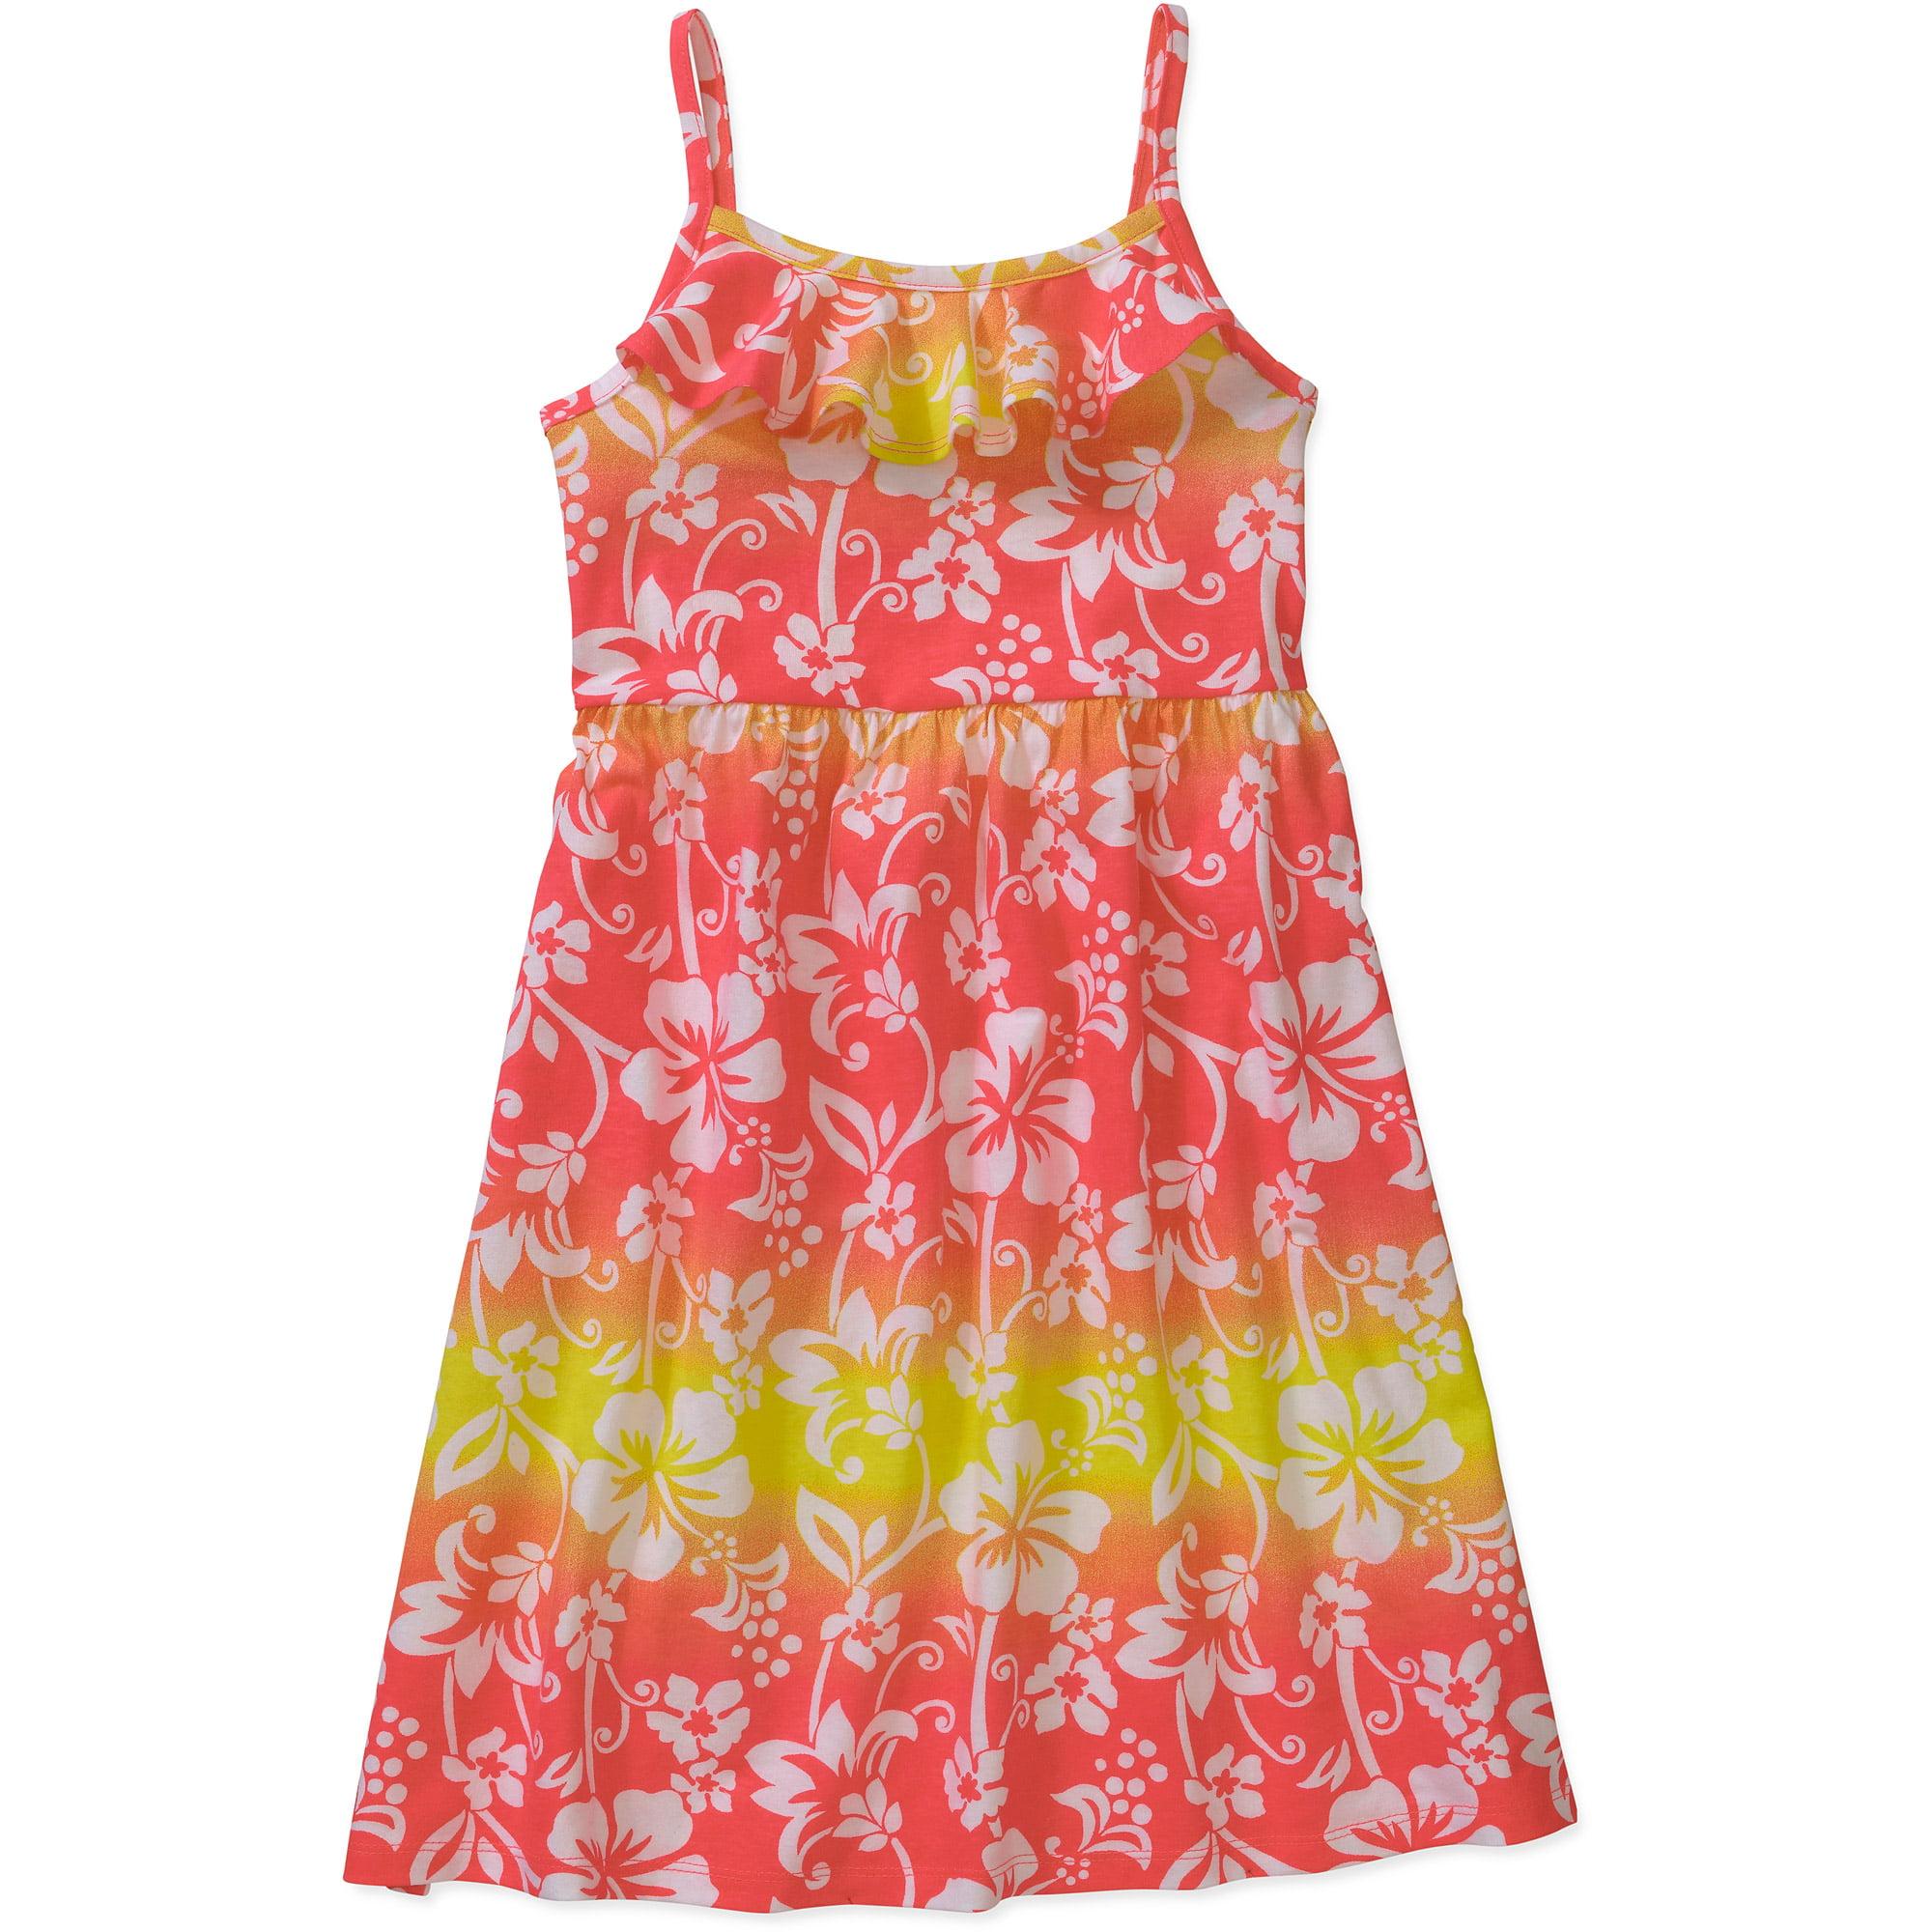 Faded Glory Girl Neck Ruffle Dress